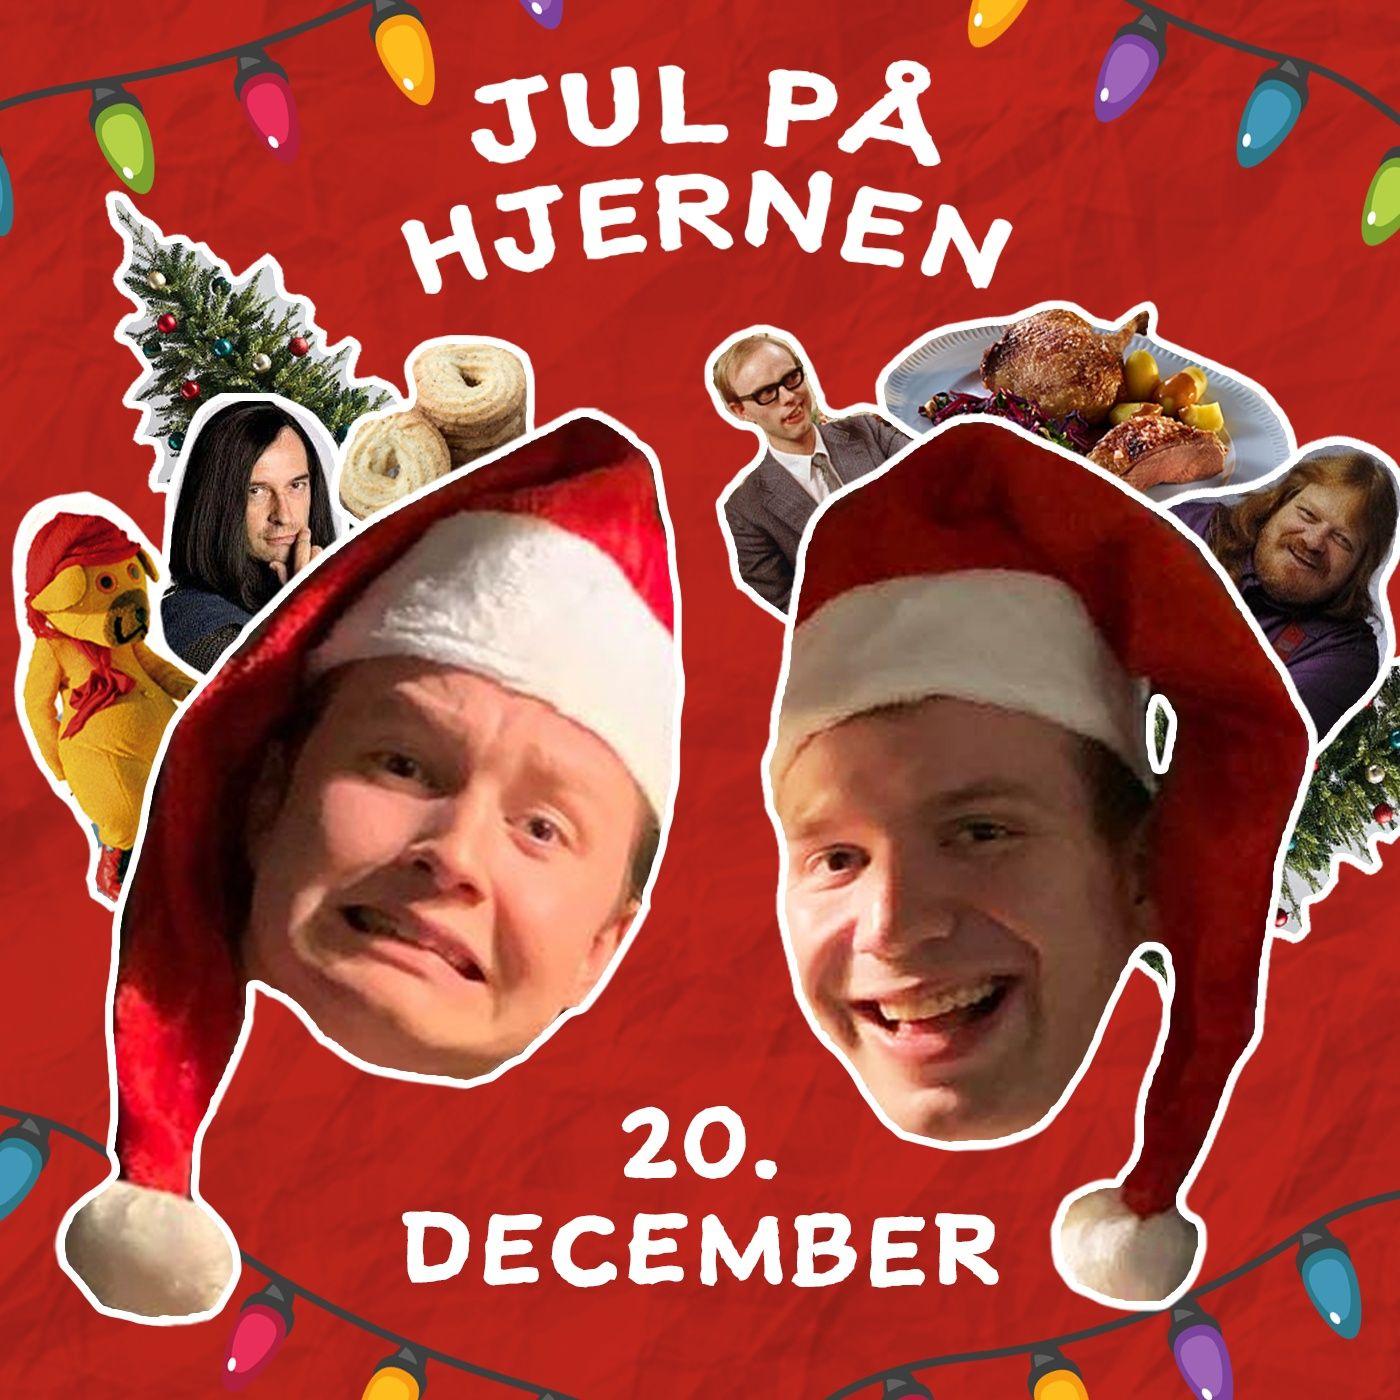 20 December - Jul på hjernen